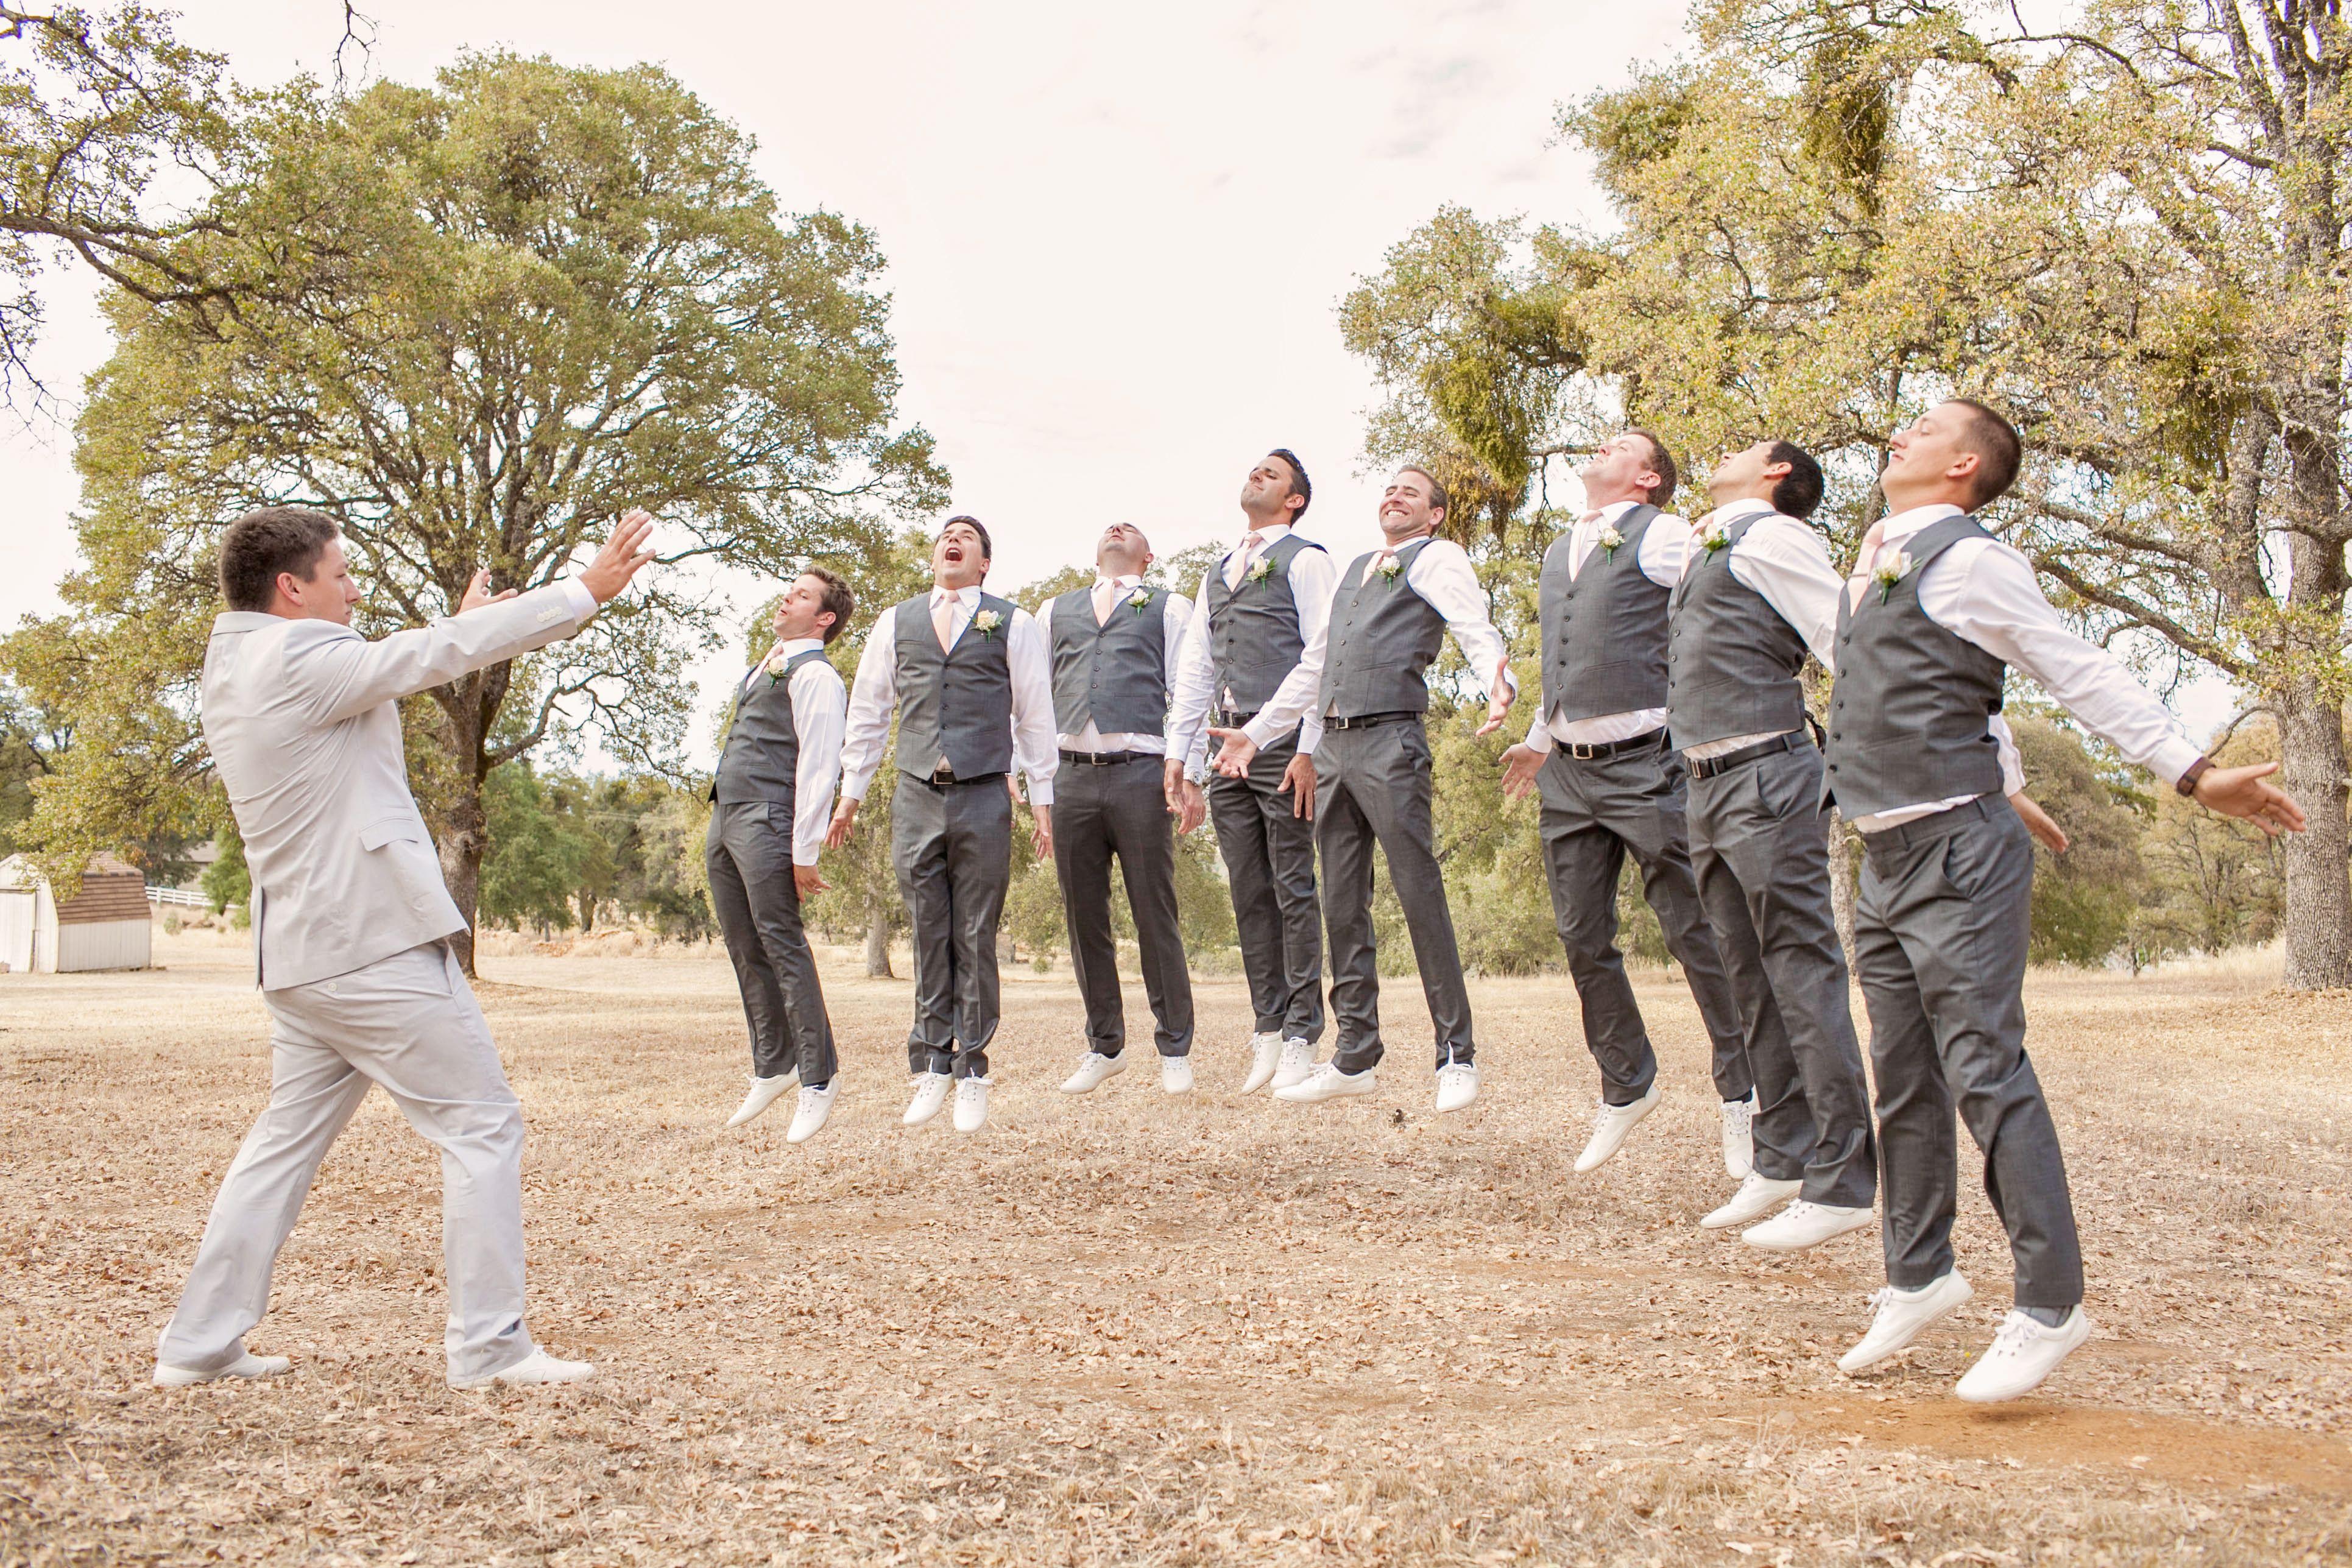 The groomsmen striking a funny pose